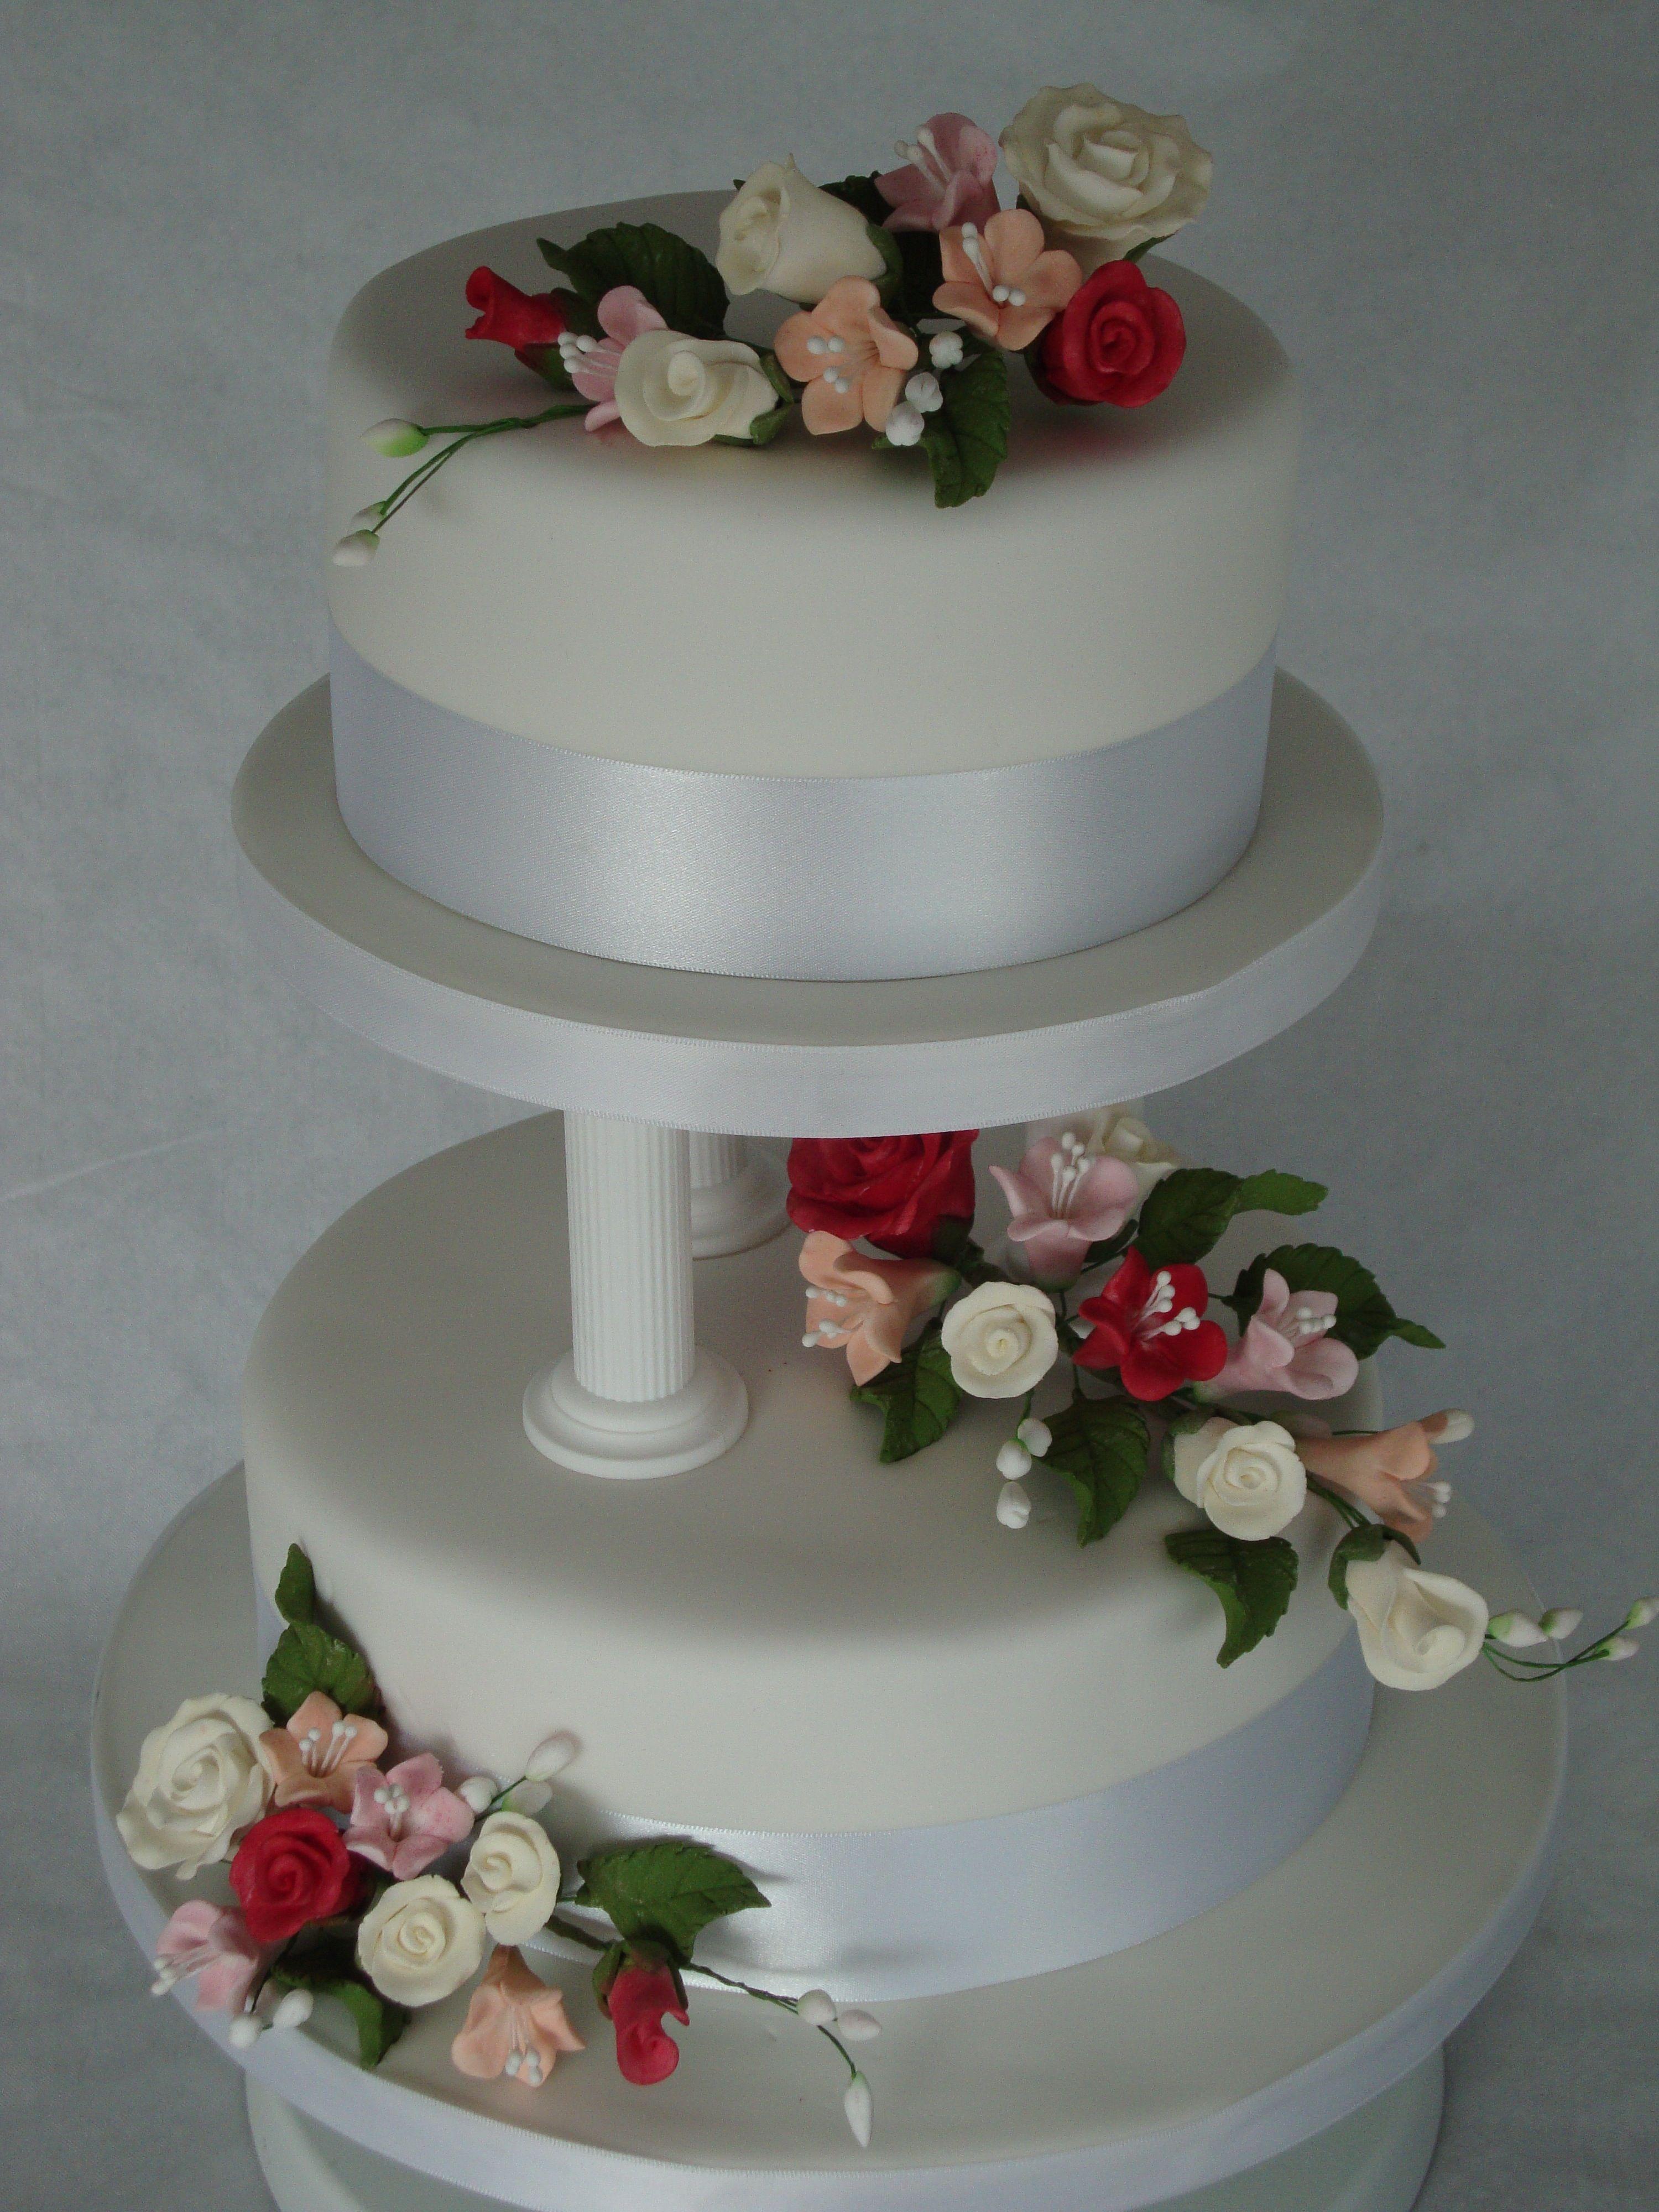 Pillar Wedding Cakes Home Gt Wedding Cakes Gt 2 Tier